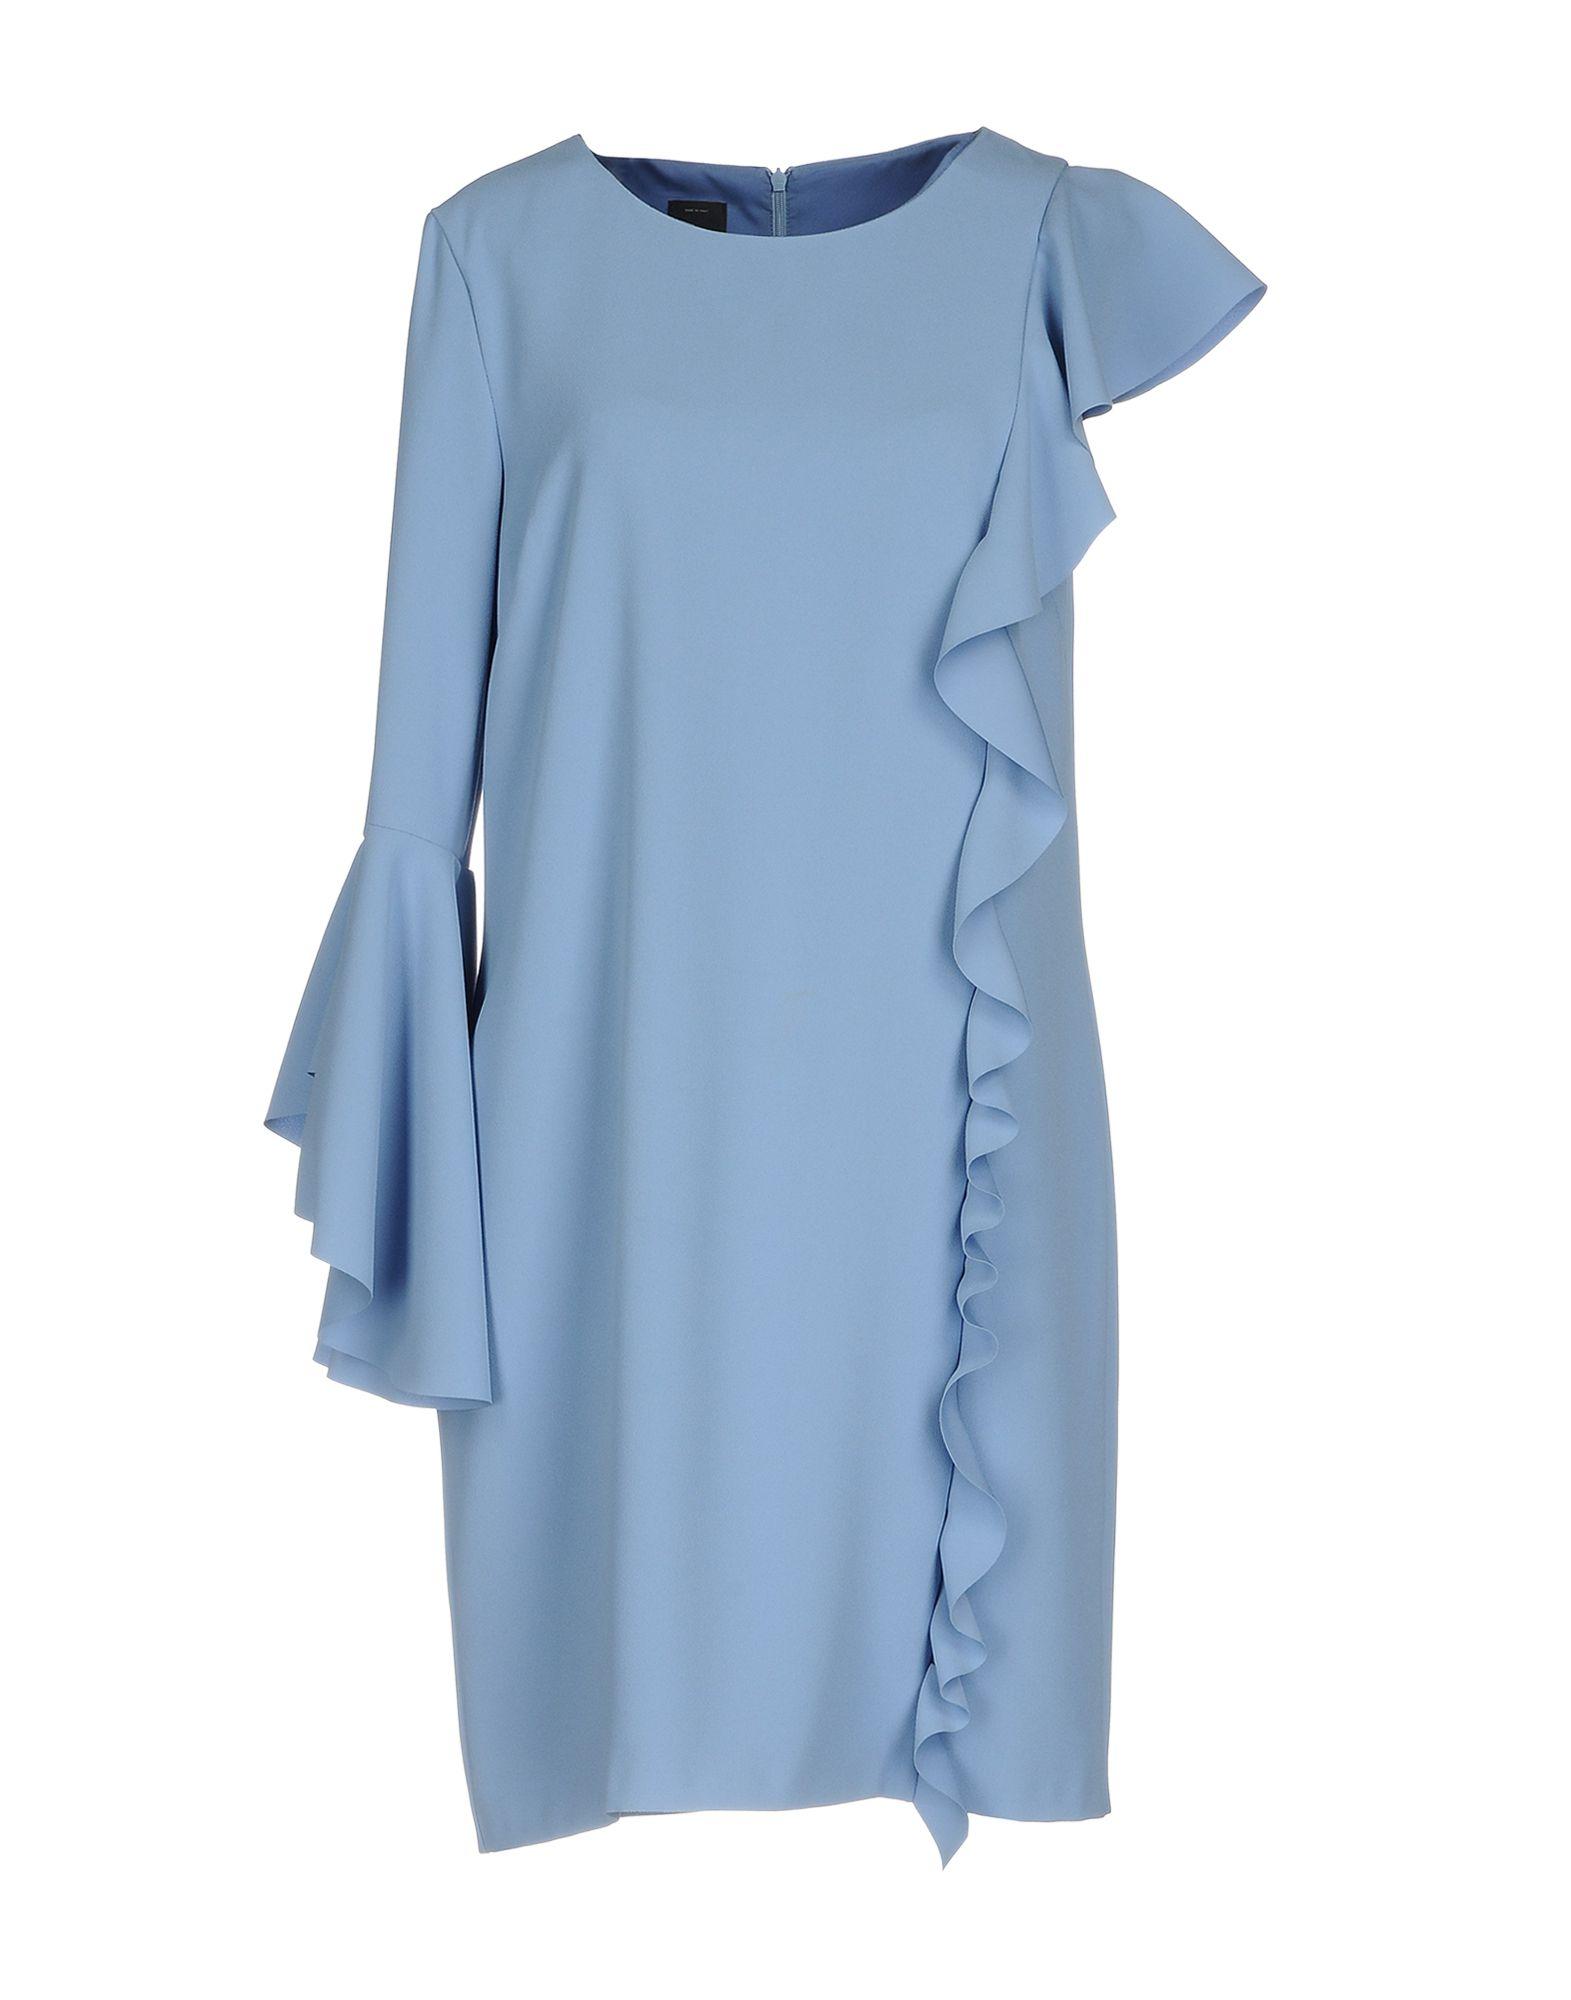 PINKO Damen Kurzes Kleid Farbe Blaugrau Größe 2